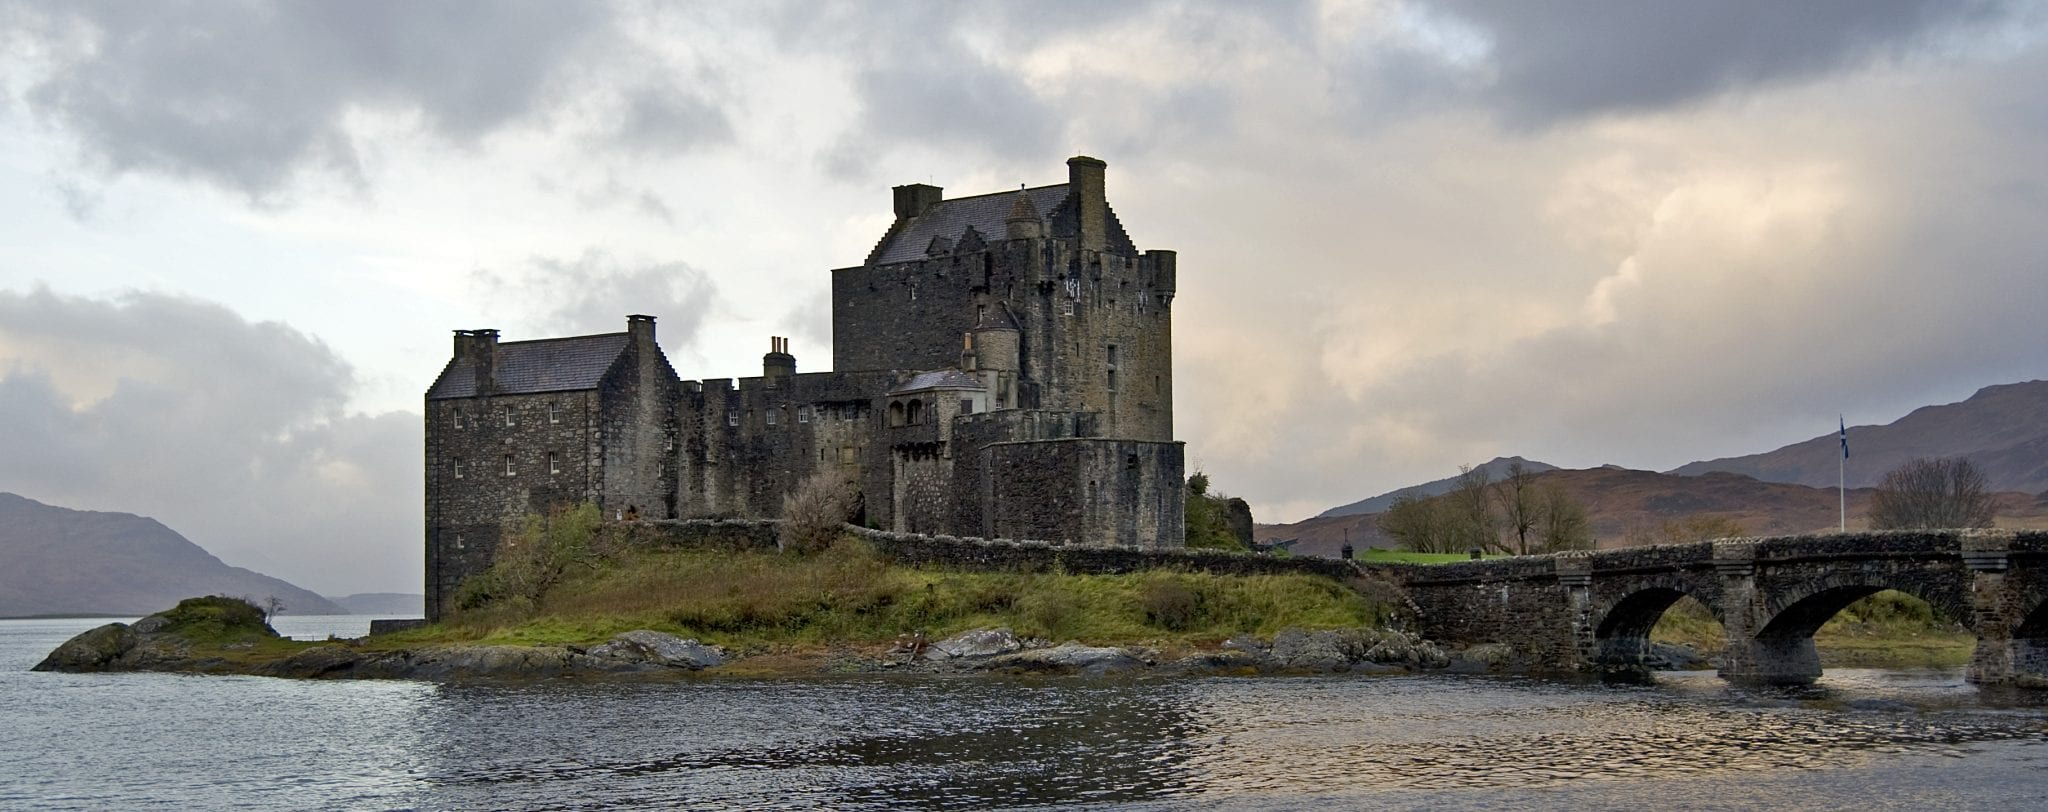 incontri Dumfries Scotland